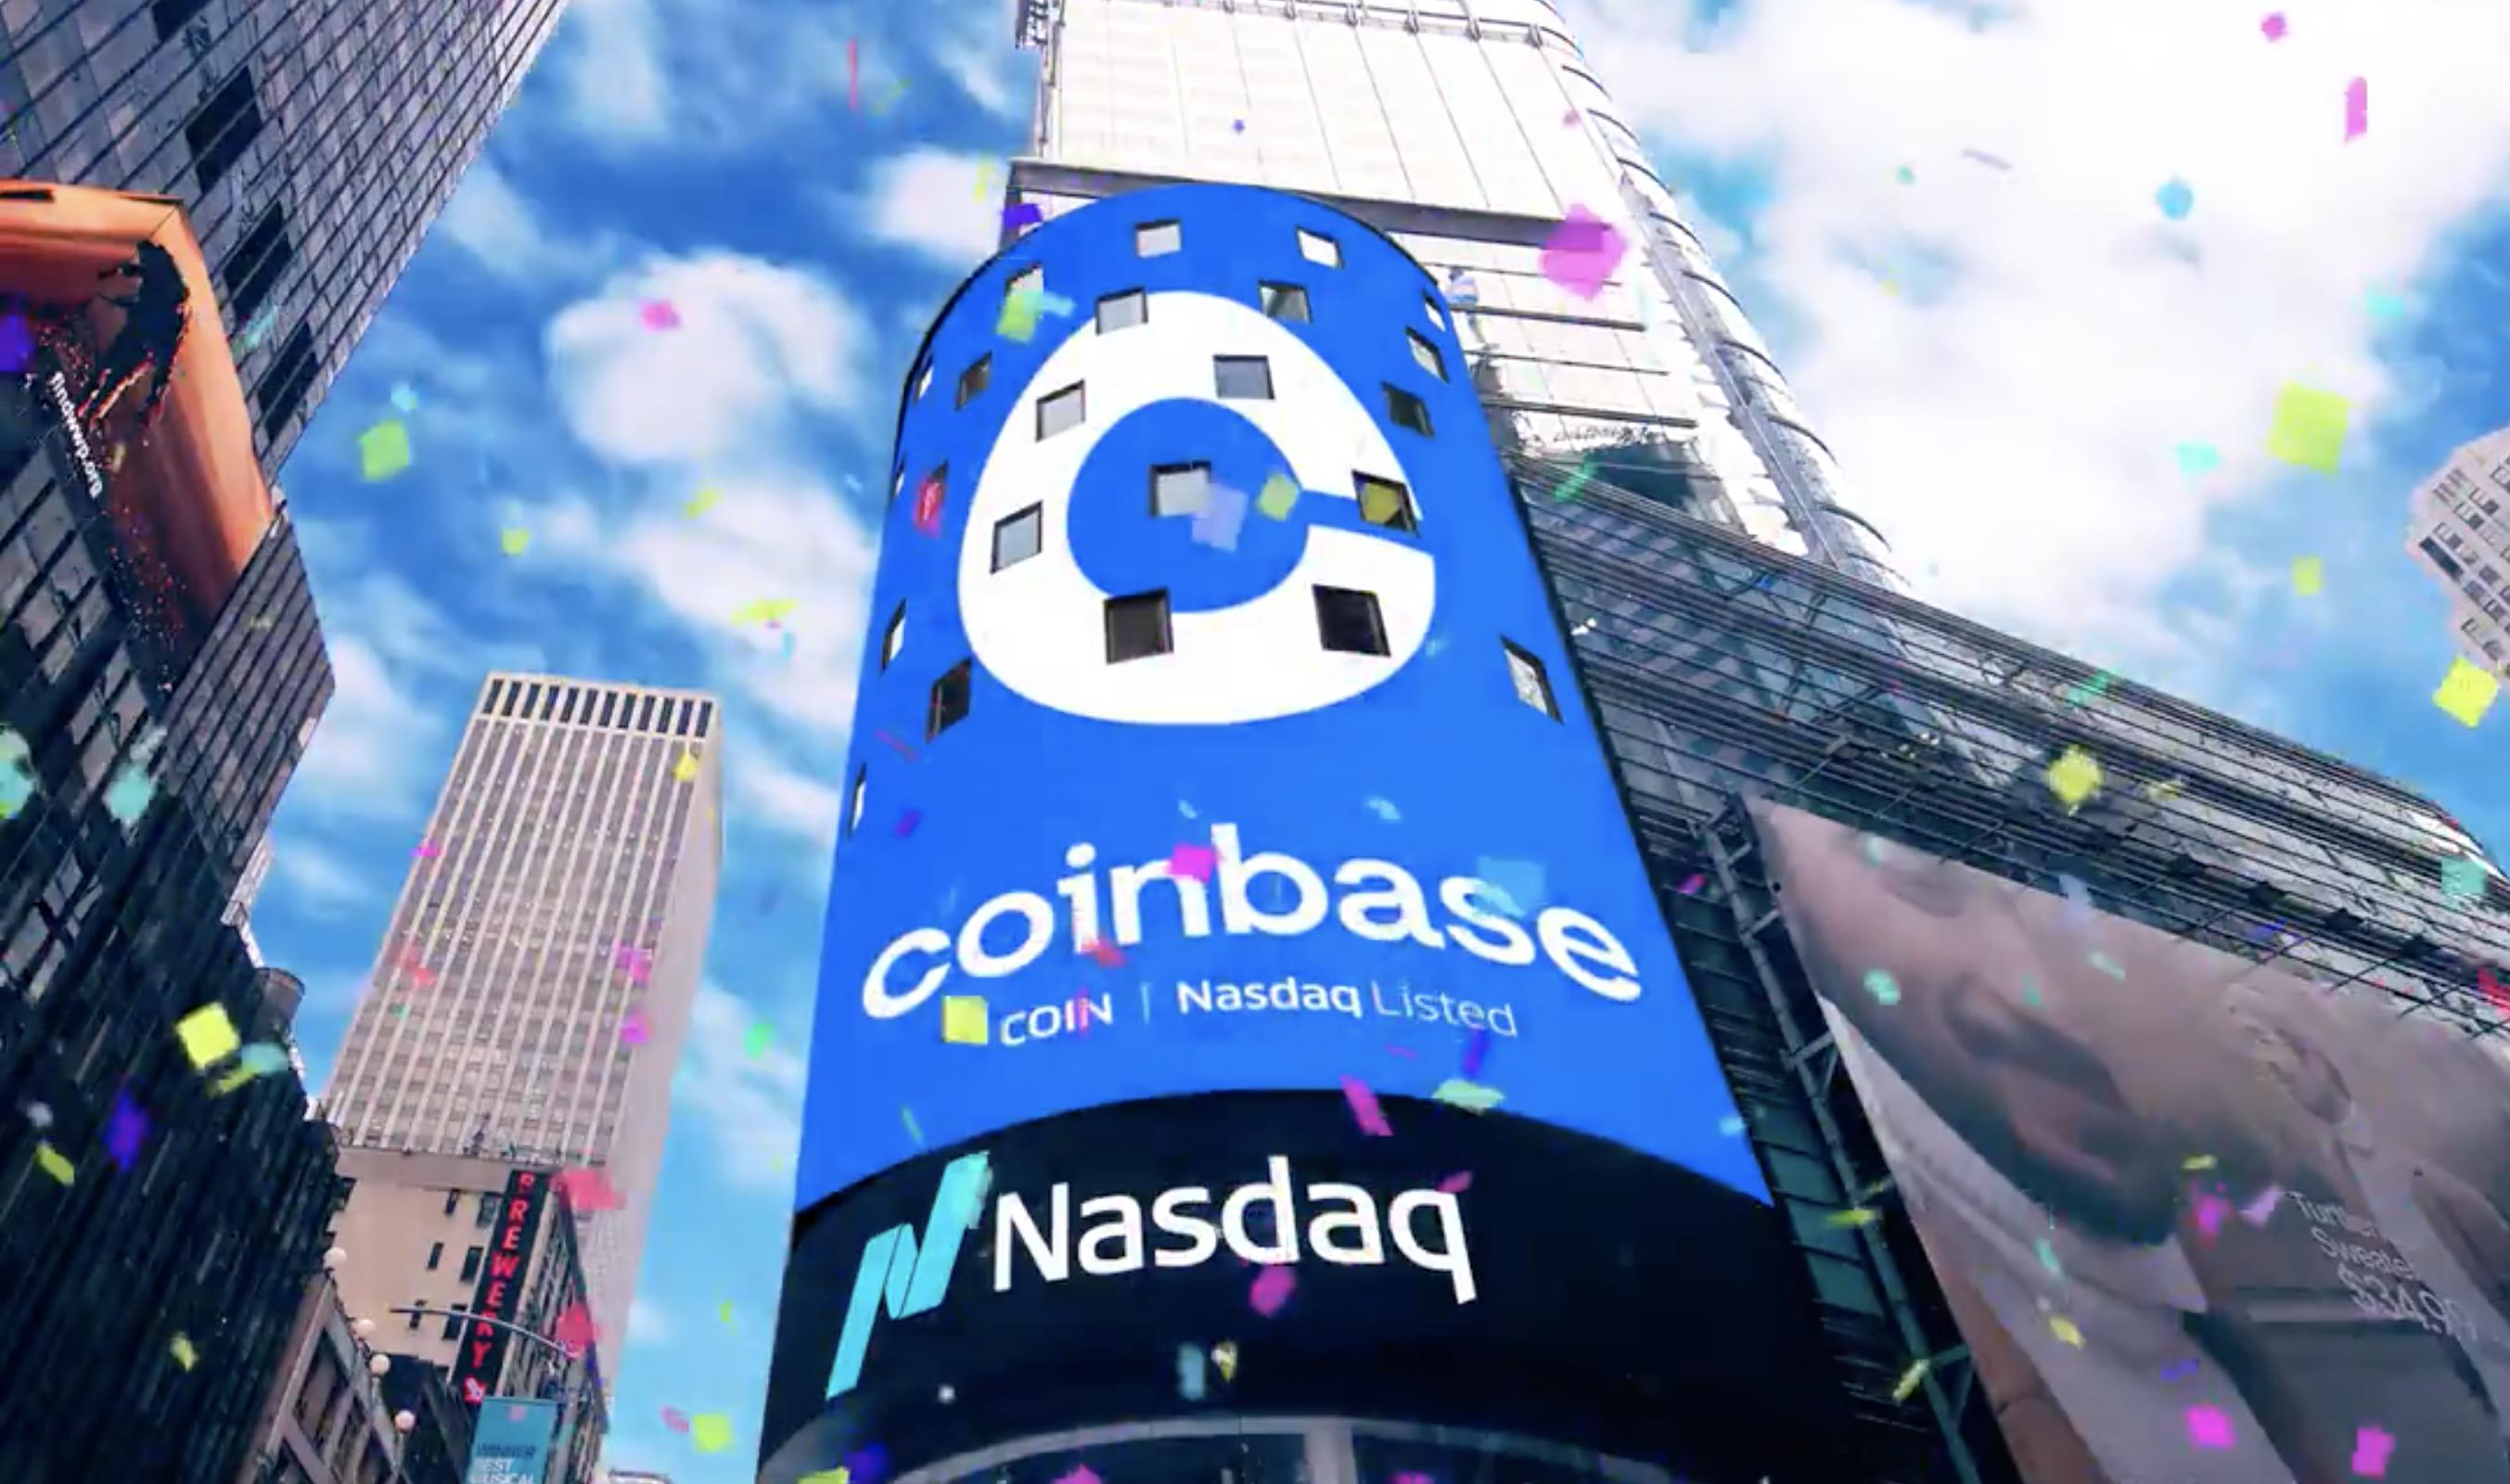 Coinbase Nasdaq Listing, April 2021